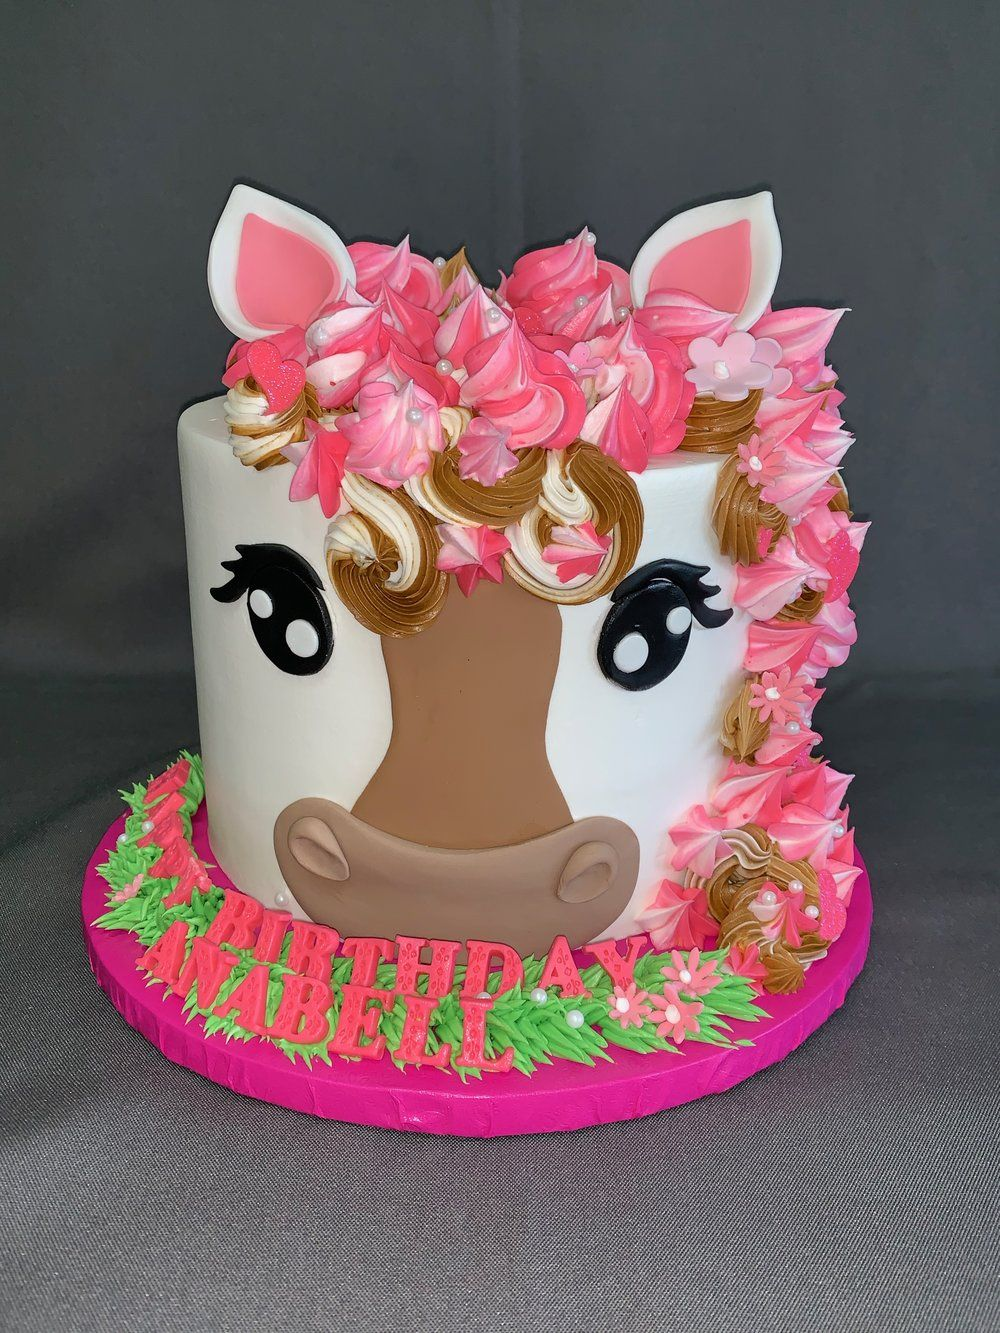 Awe Inspiring Baby Horse Cake Skazka Desserts Bakery Nj Custom Birthday Funny Birthday Cards Online Ioscodamsfinfo